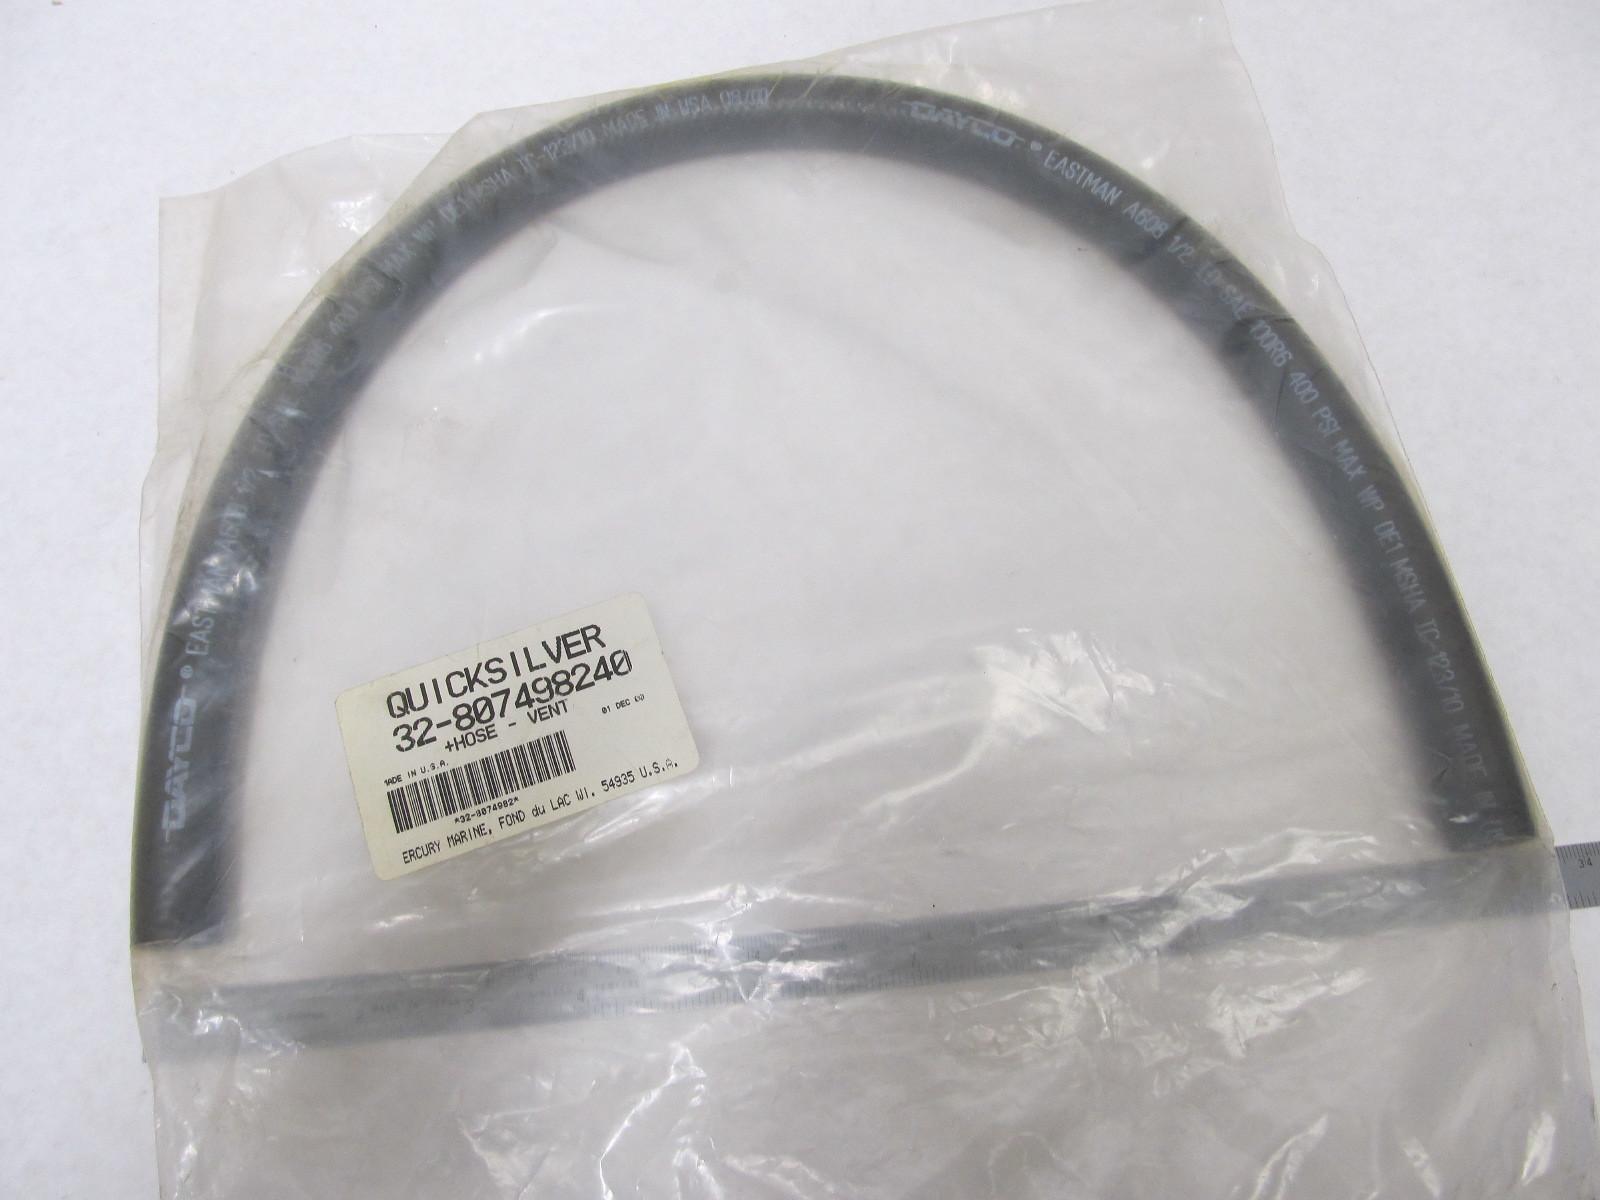 32-807498240 9331512 Quicksilver Vent Hose Tubing for Mercruiser